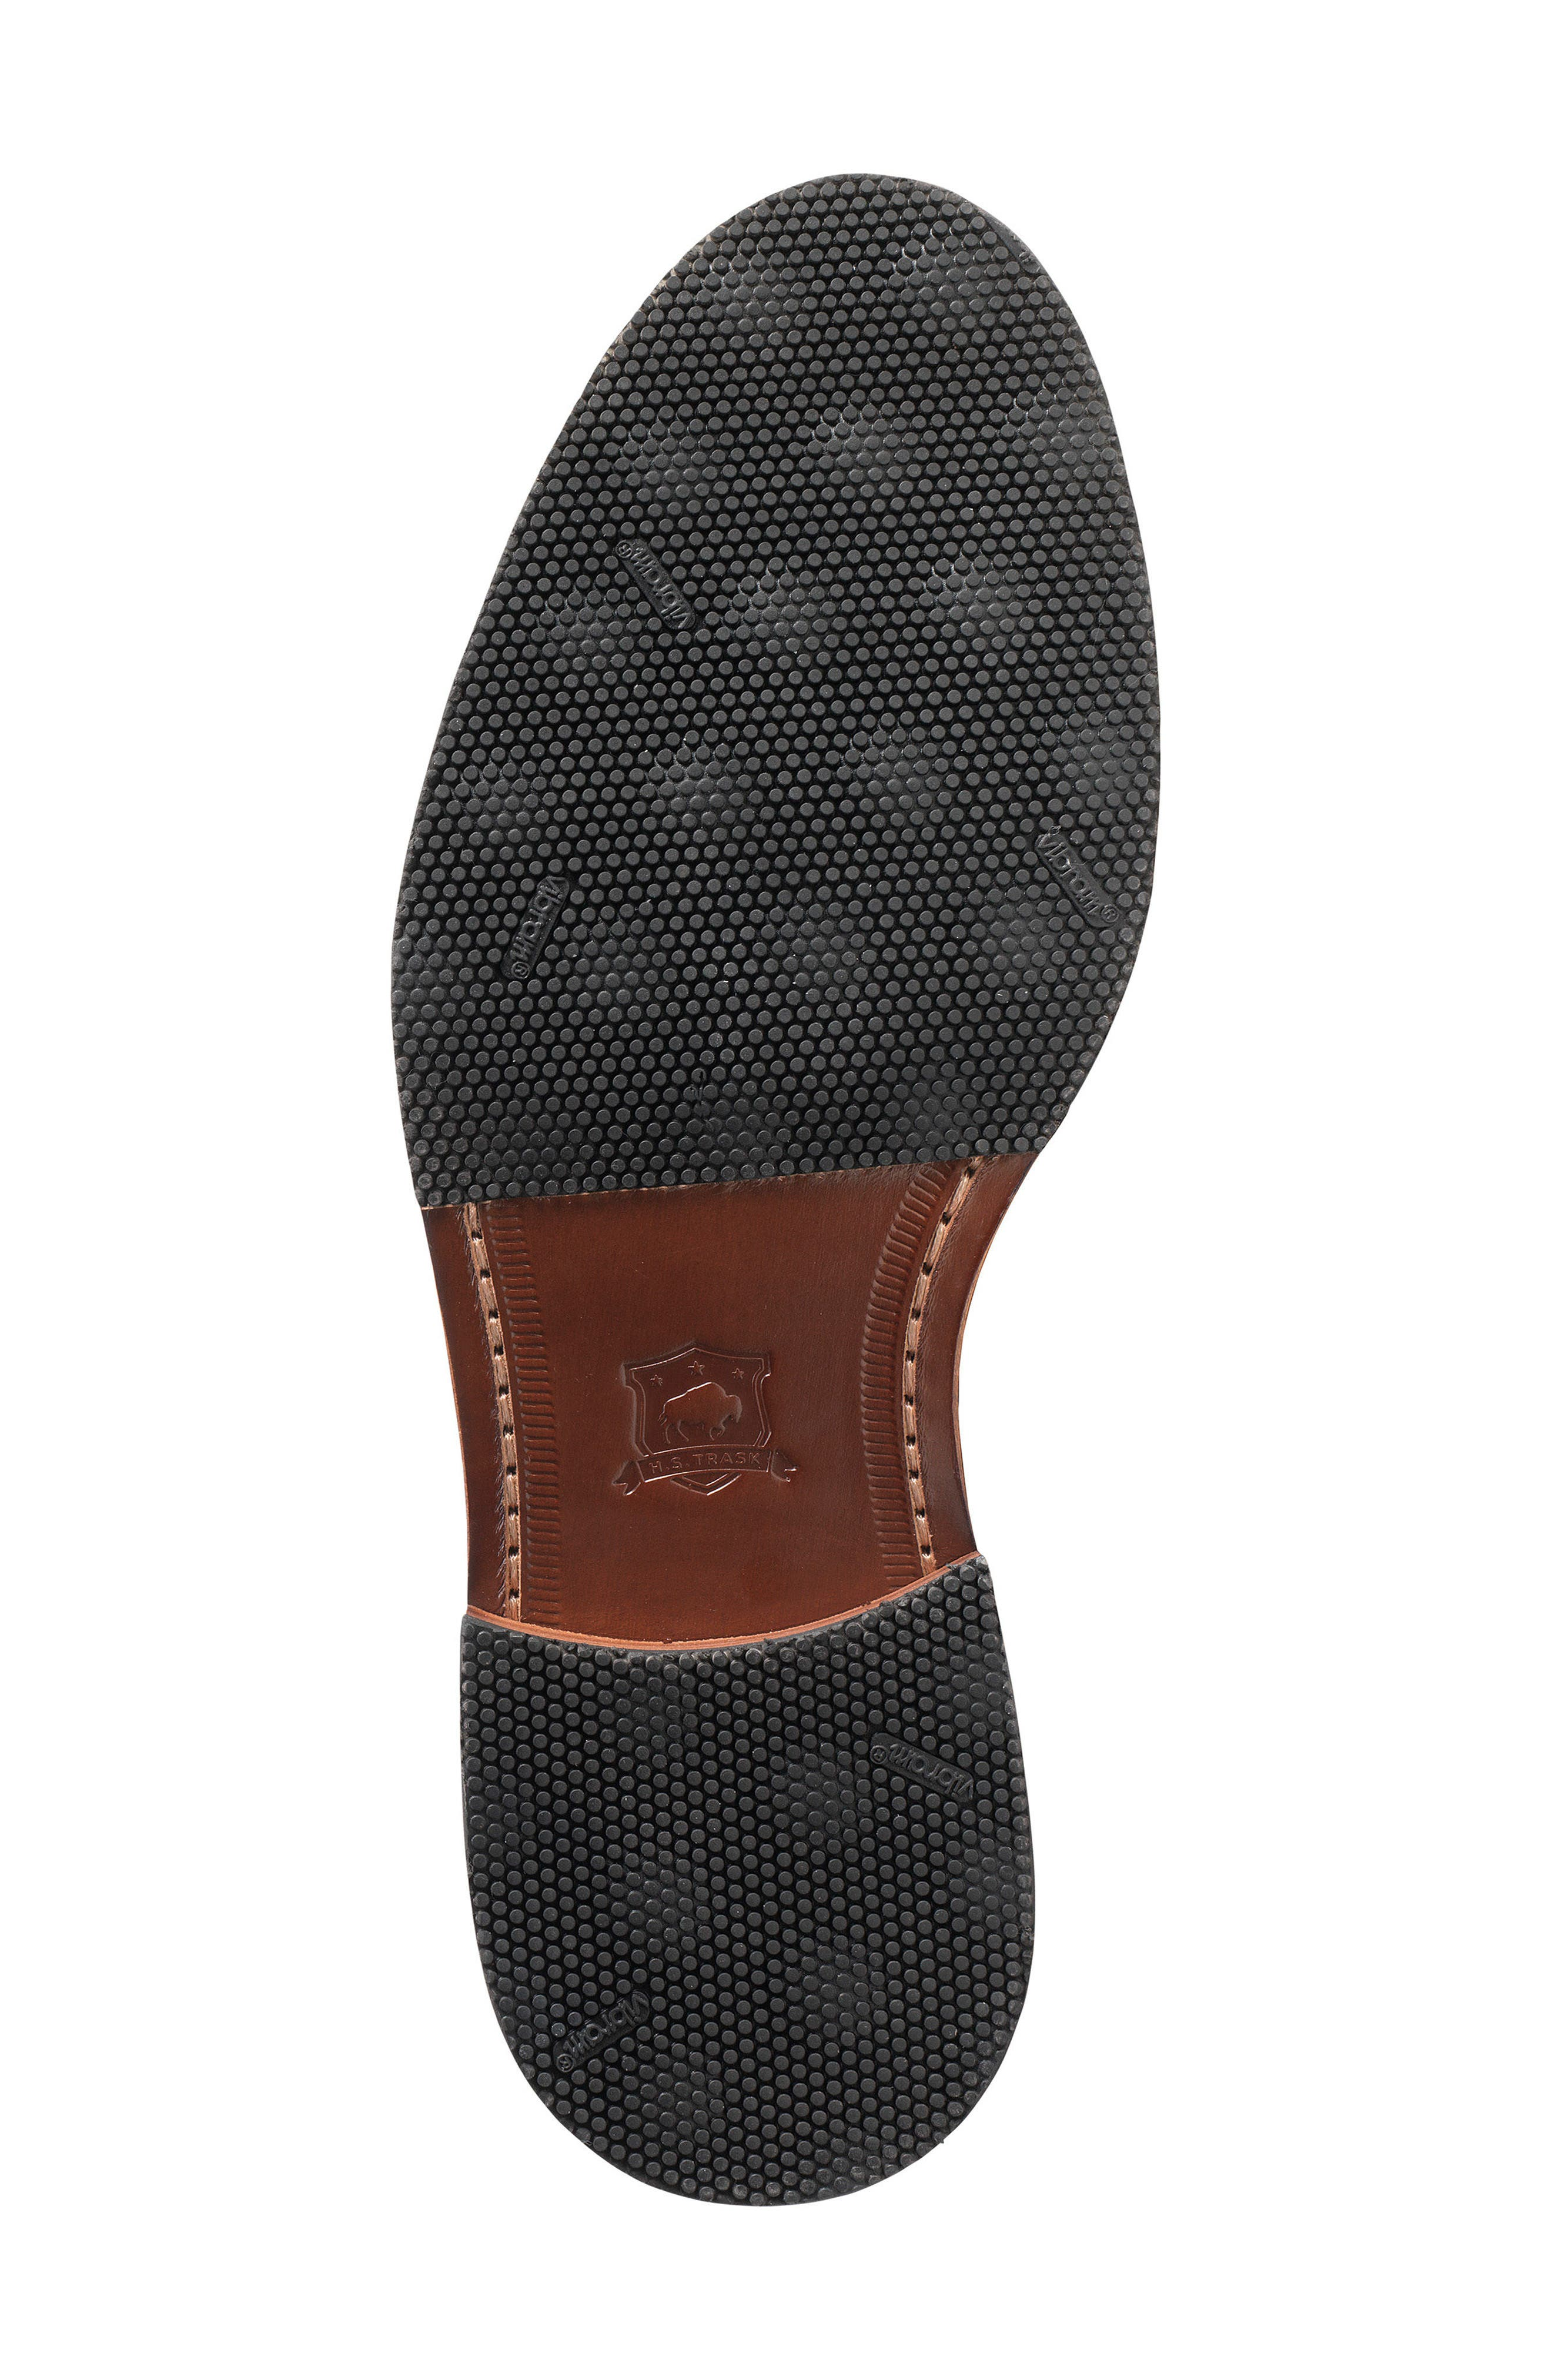 Leland Double Monk Strap Shoe,                             Alternate thumbnail 4, color,                             GRAY WAXED SUEDE